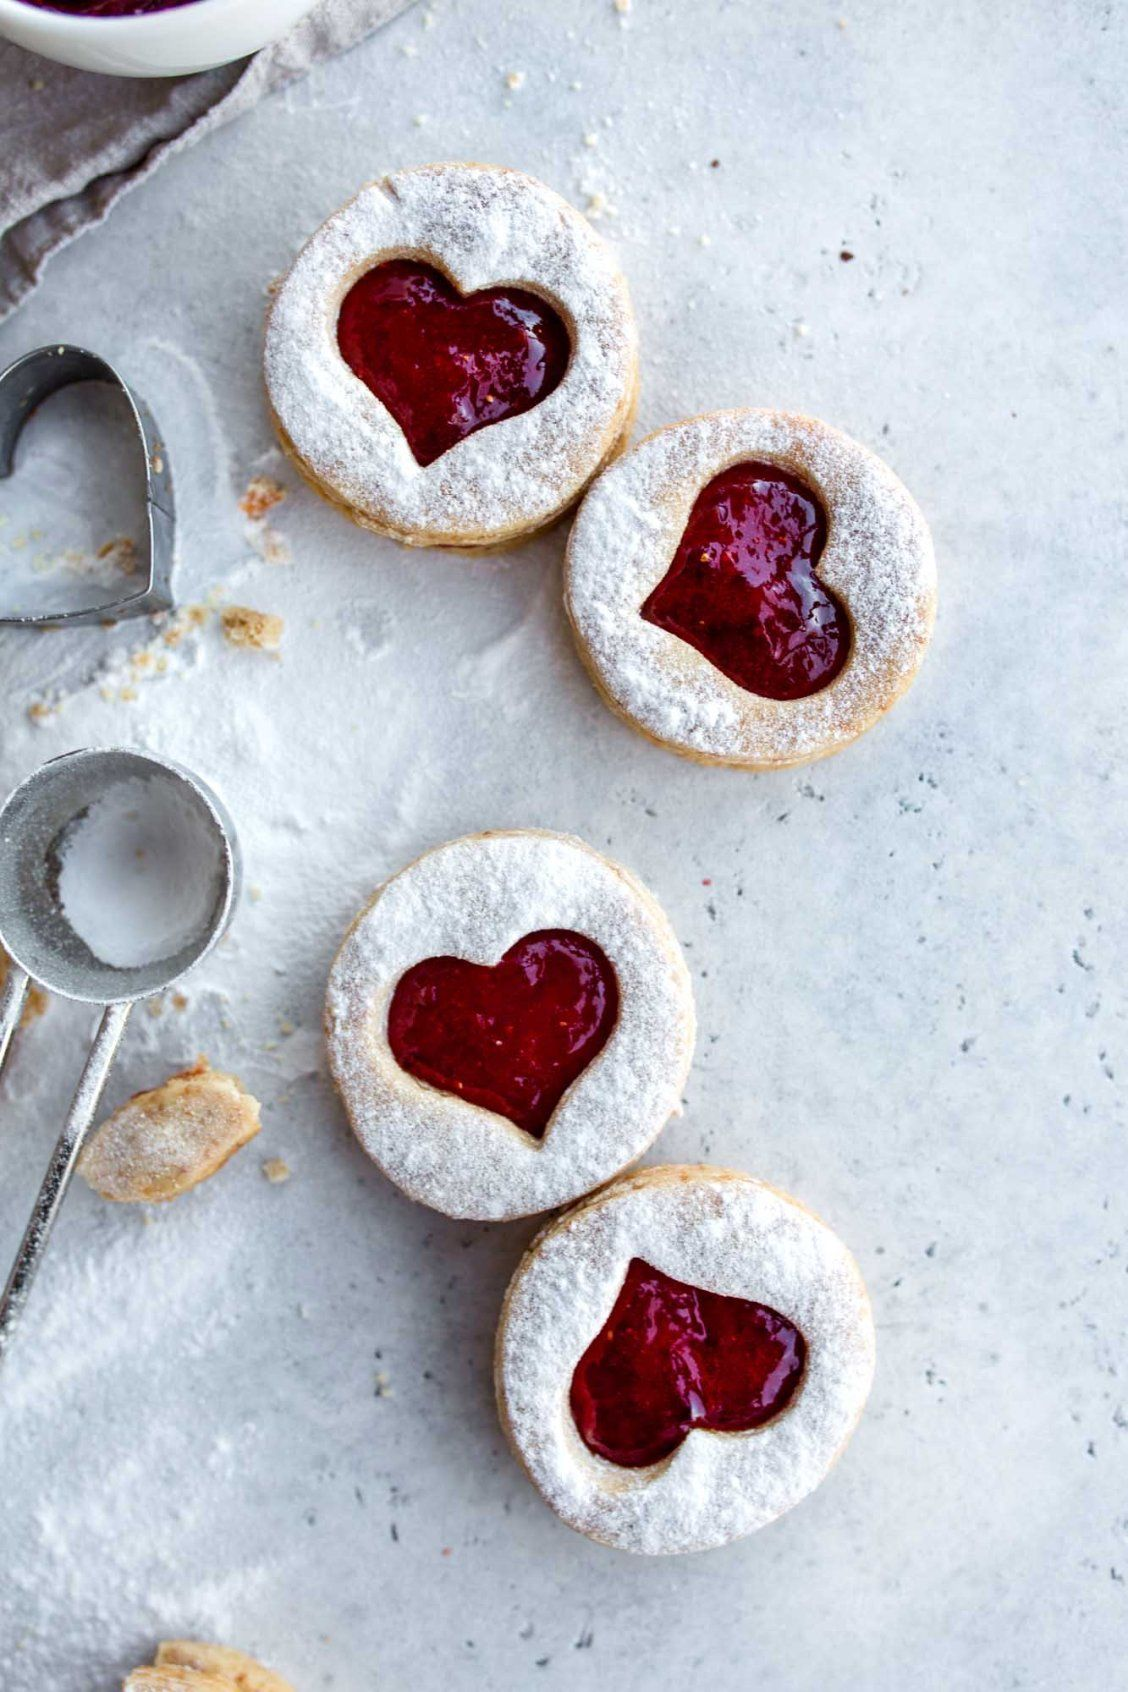 Easy Vegan Christmas Cookies Everyone Can Make